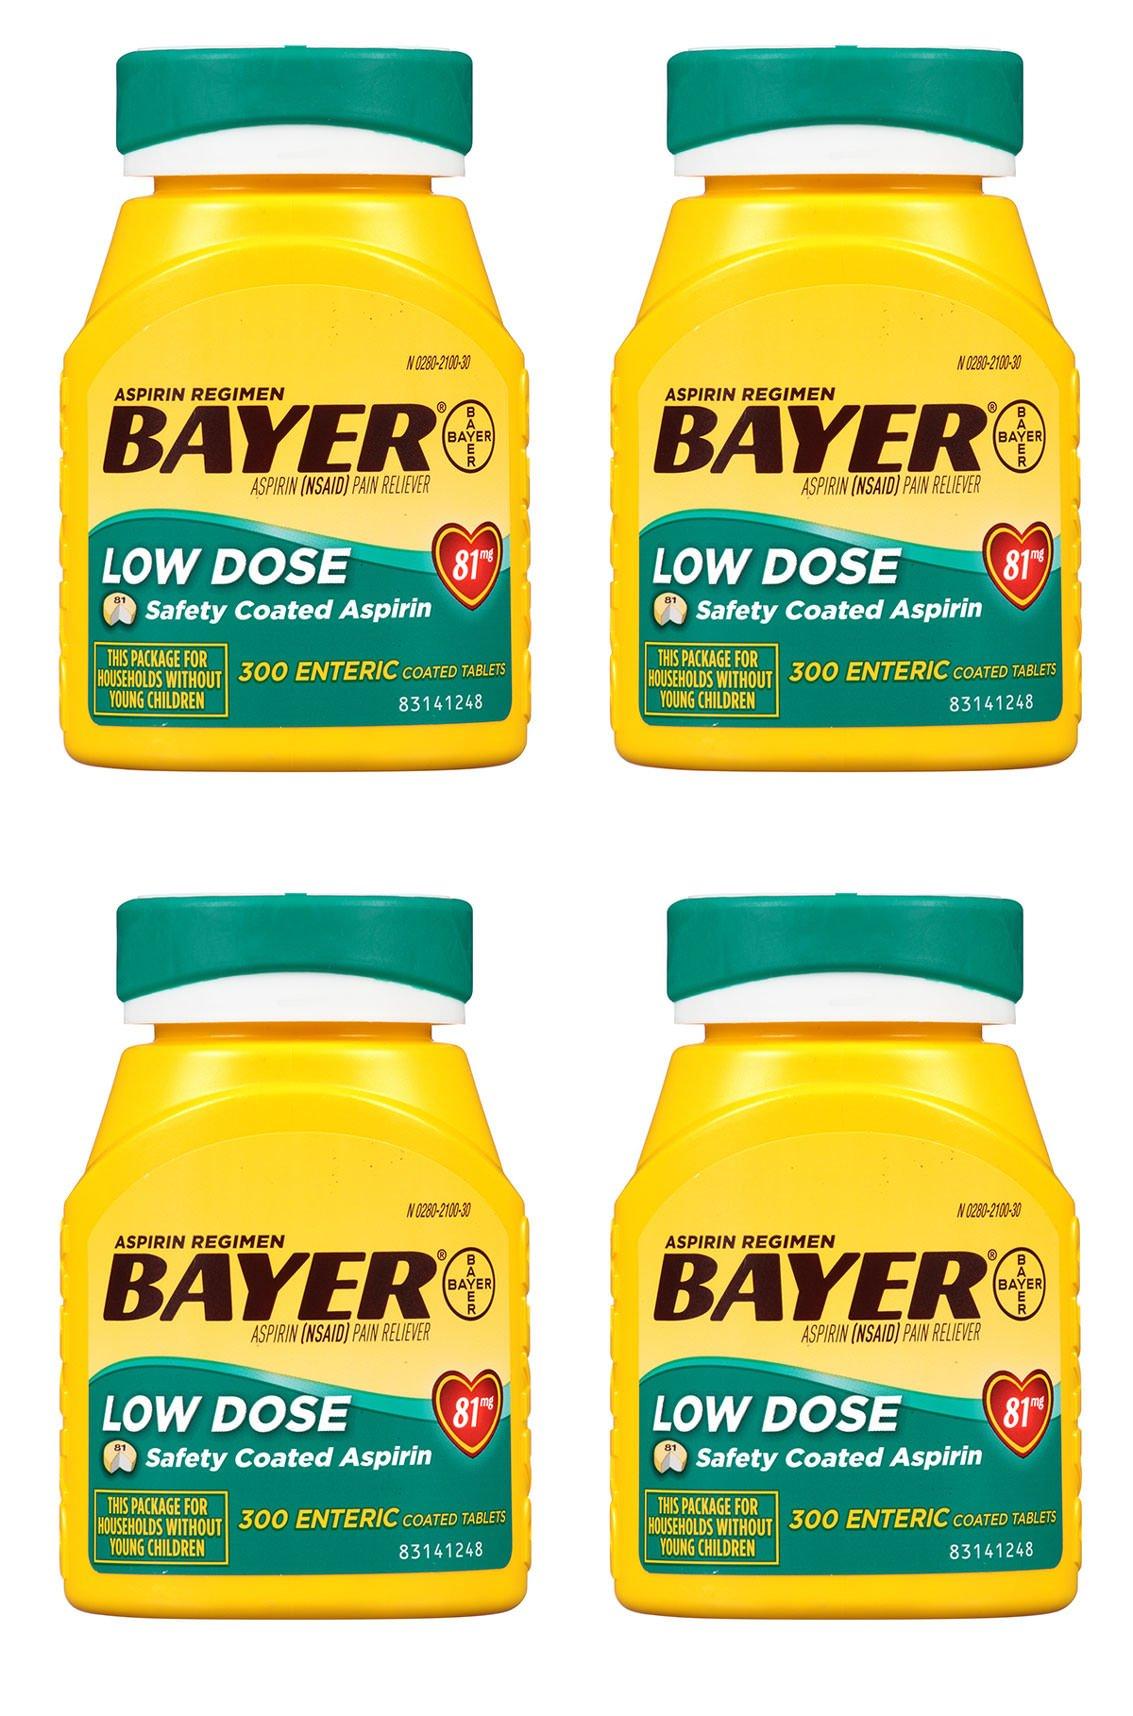 Bayer Aspirin Regimen, Low Dose (81 mg), Enteric Coated, 300 Count, 4 Pack